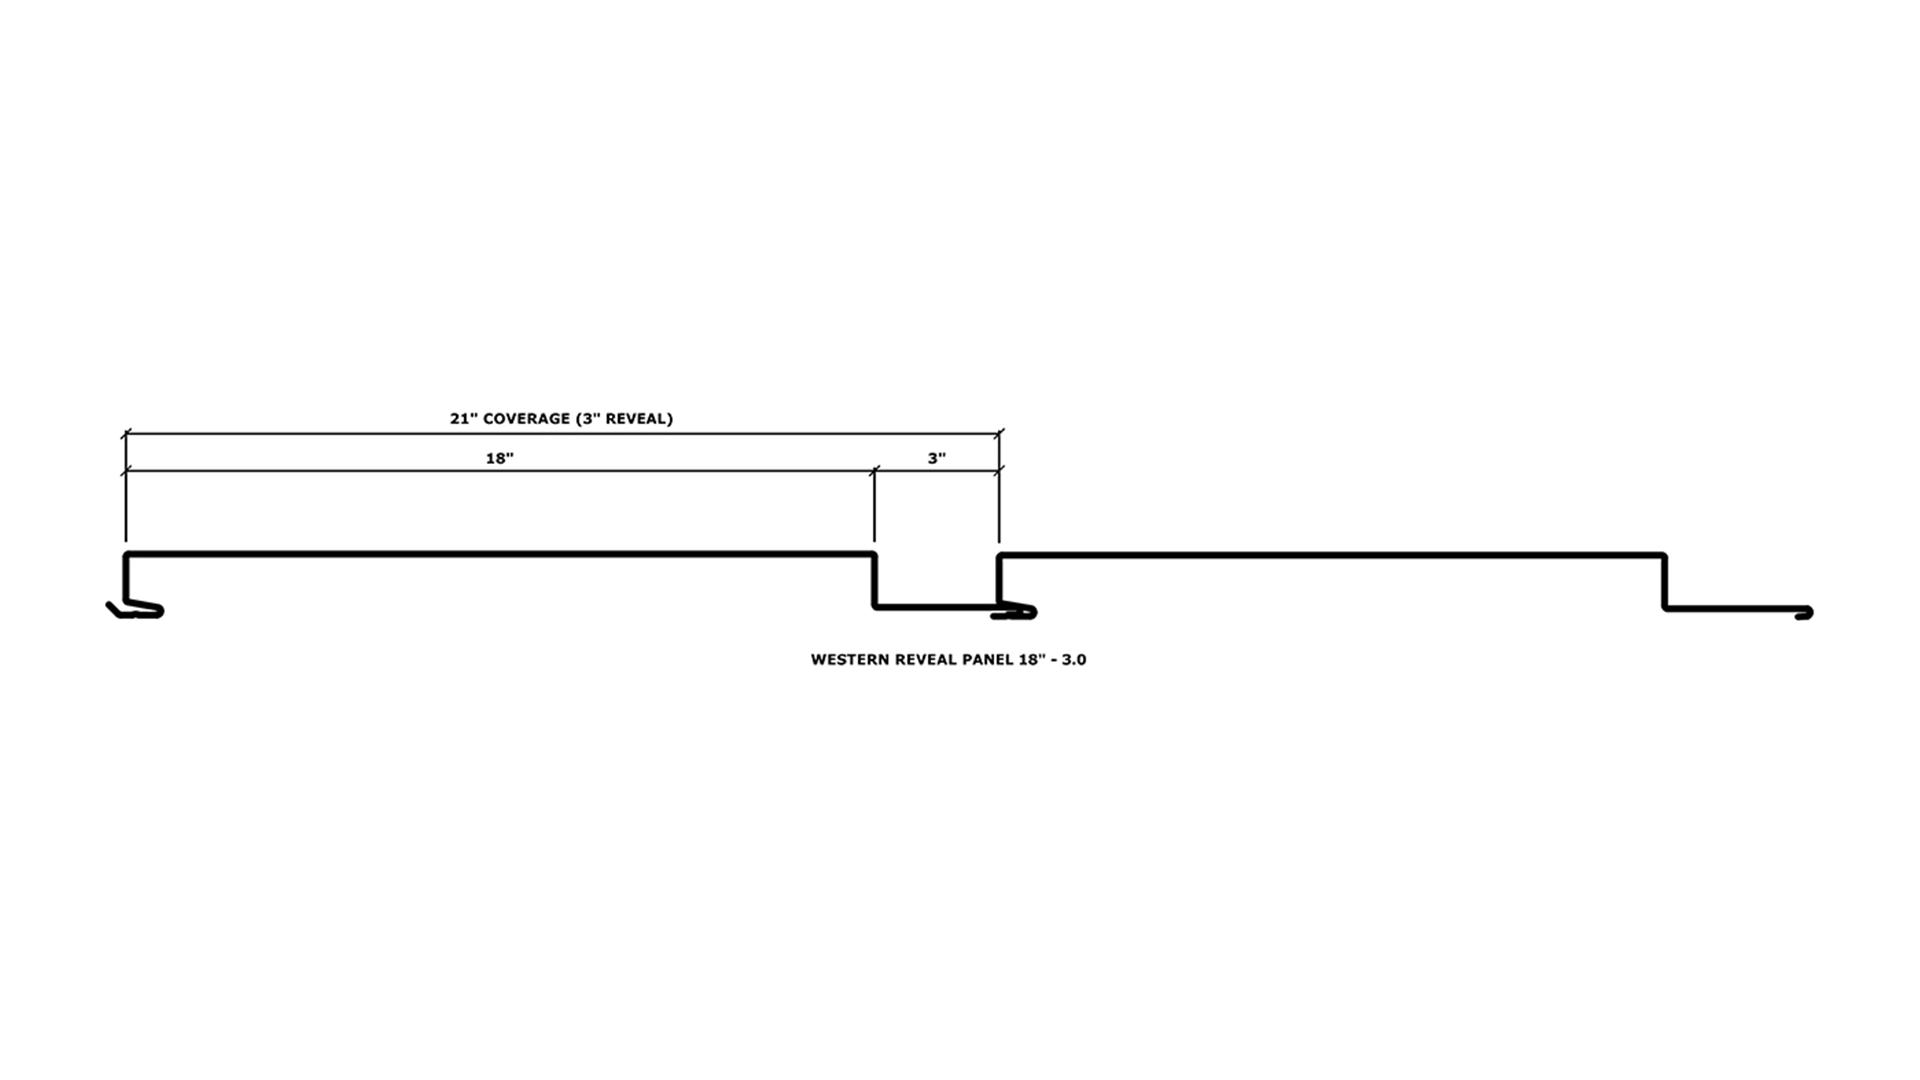 https://f.hubspotusercontent30.net/hubfs/6069238/images/line-drawings/western-reveal-line-drawing.jpg